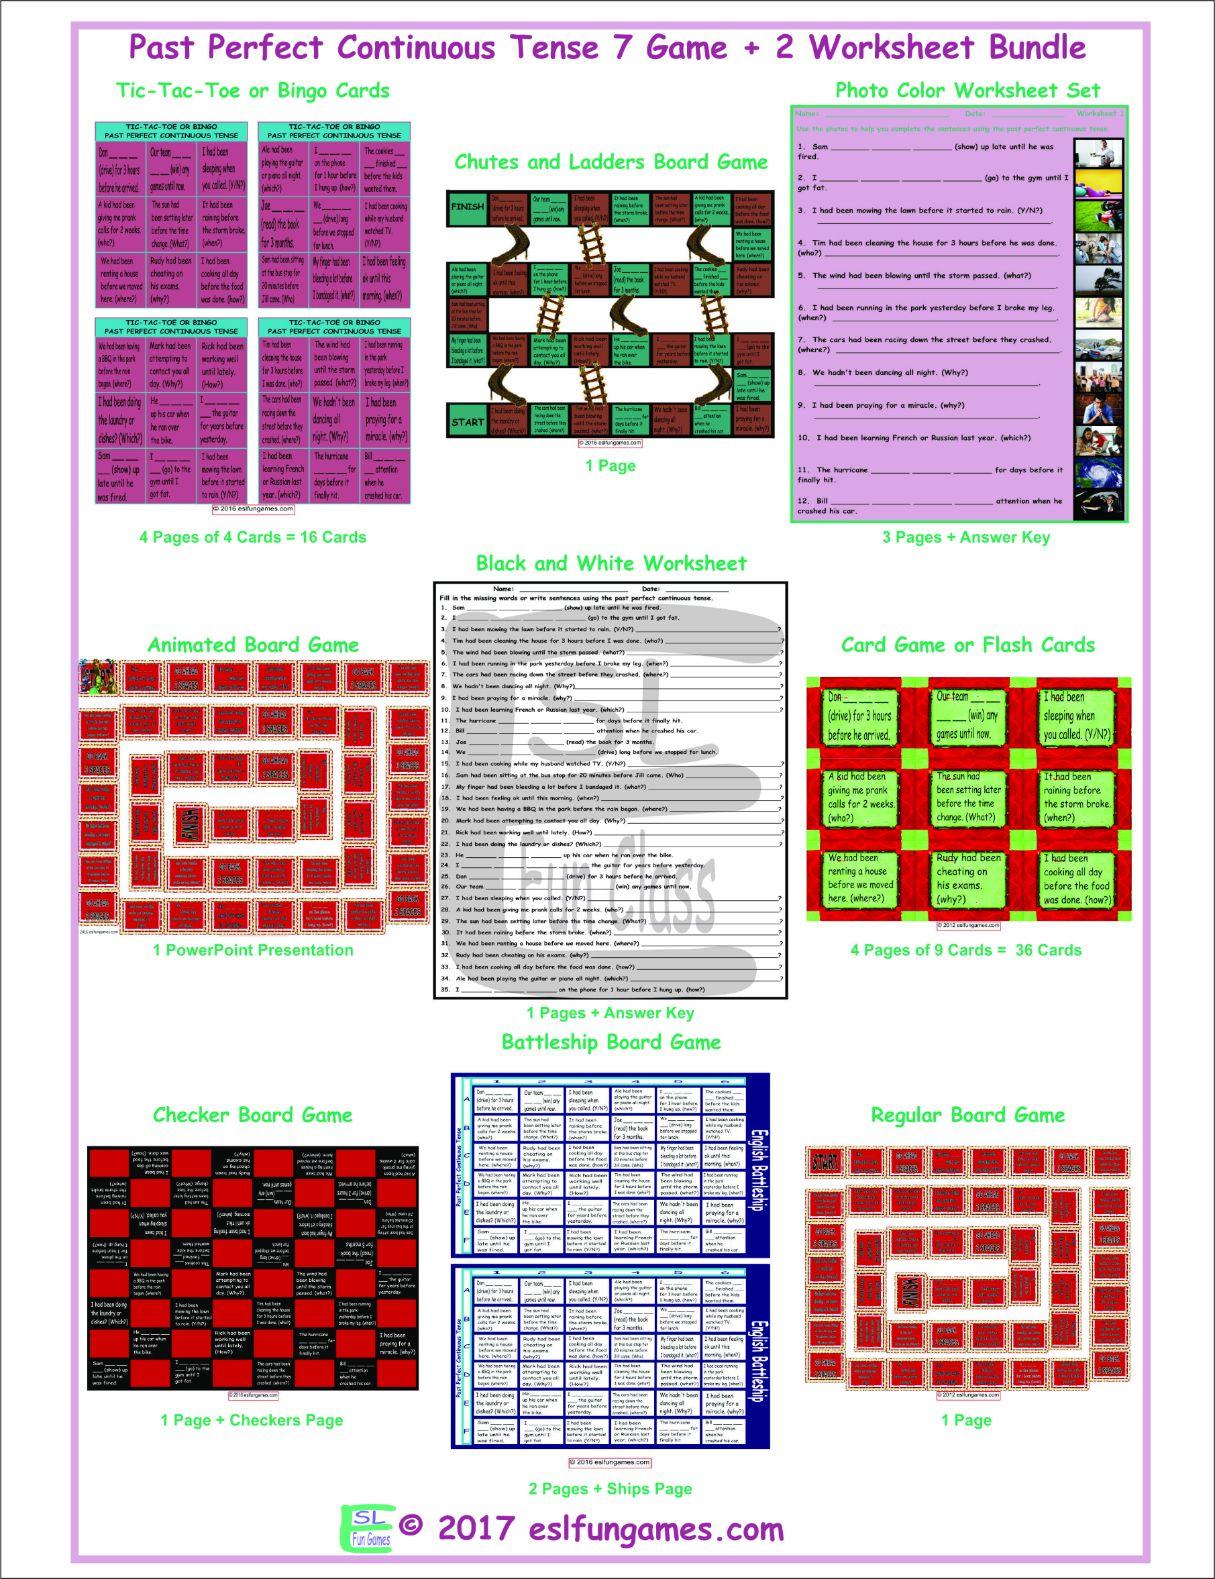 Past Perfect Continuous Tense 7 Game Plus 2 Worksheet